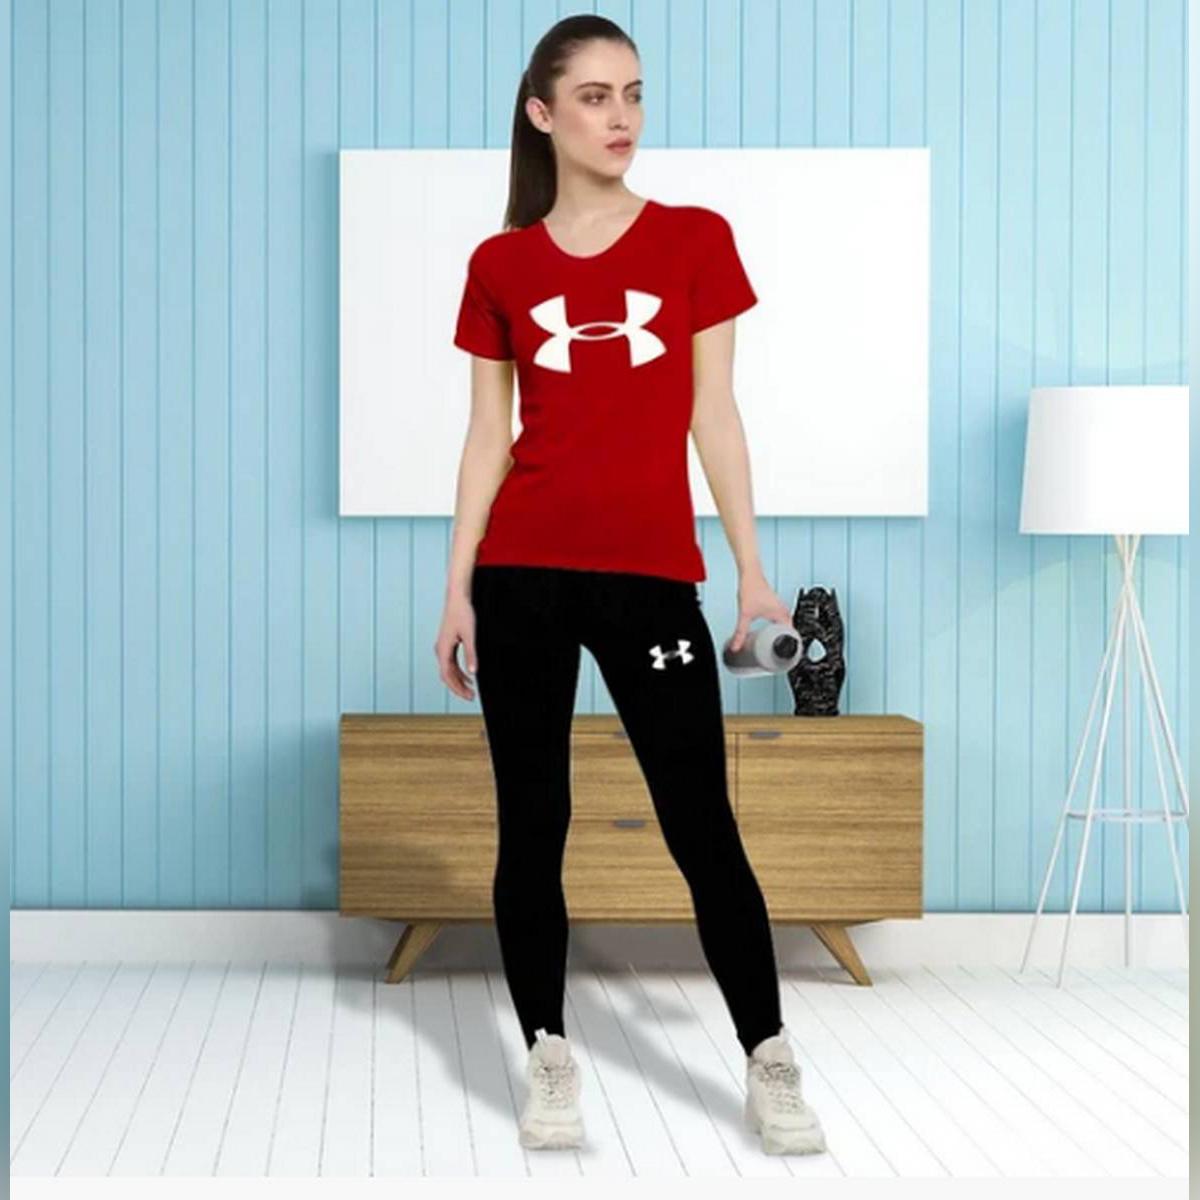 Summer Ladies Exercise / Girls Sport Suit / Yoga & Workout / Fitness & Gym Suit / Jogging / Track Dress